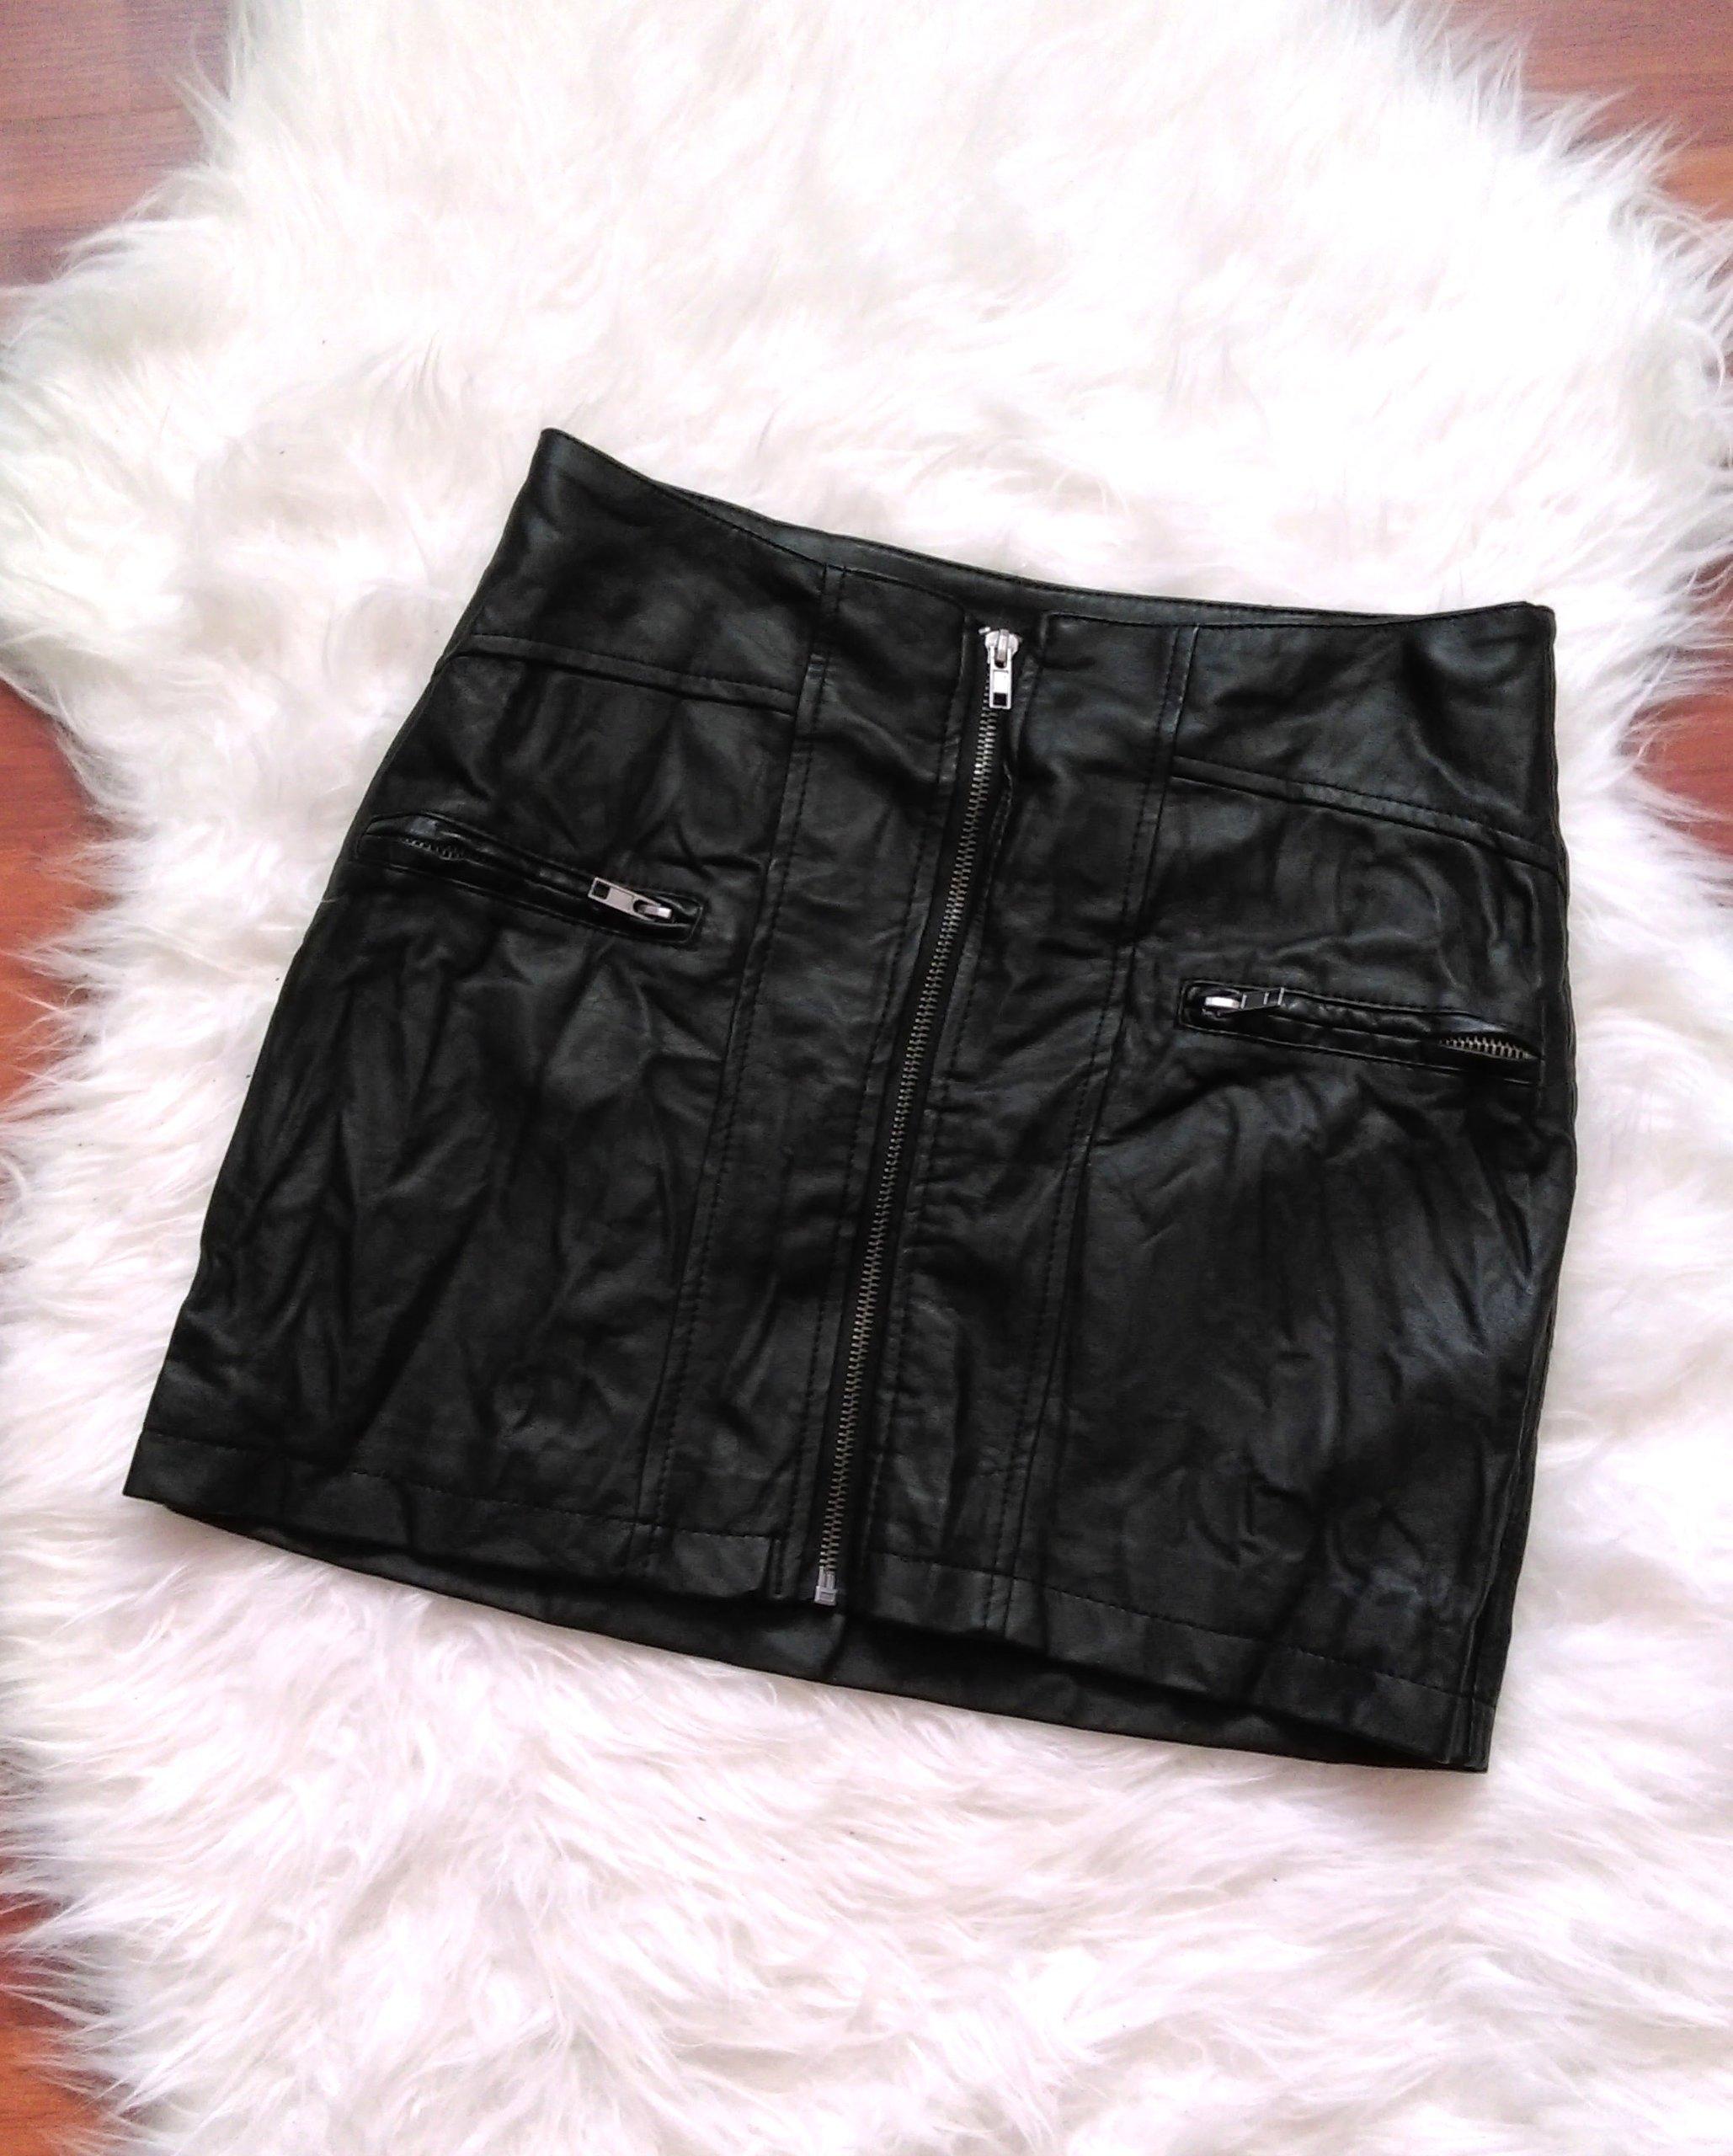 Czarna spódnica z eko skóry z zamkiem